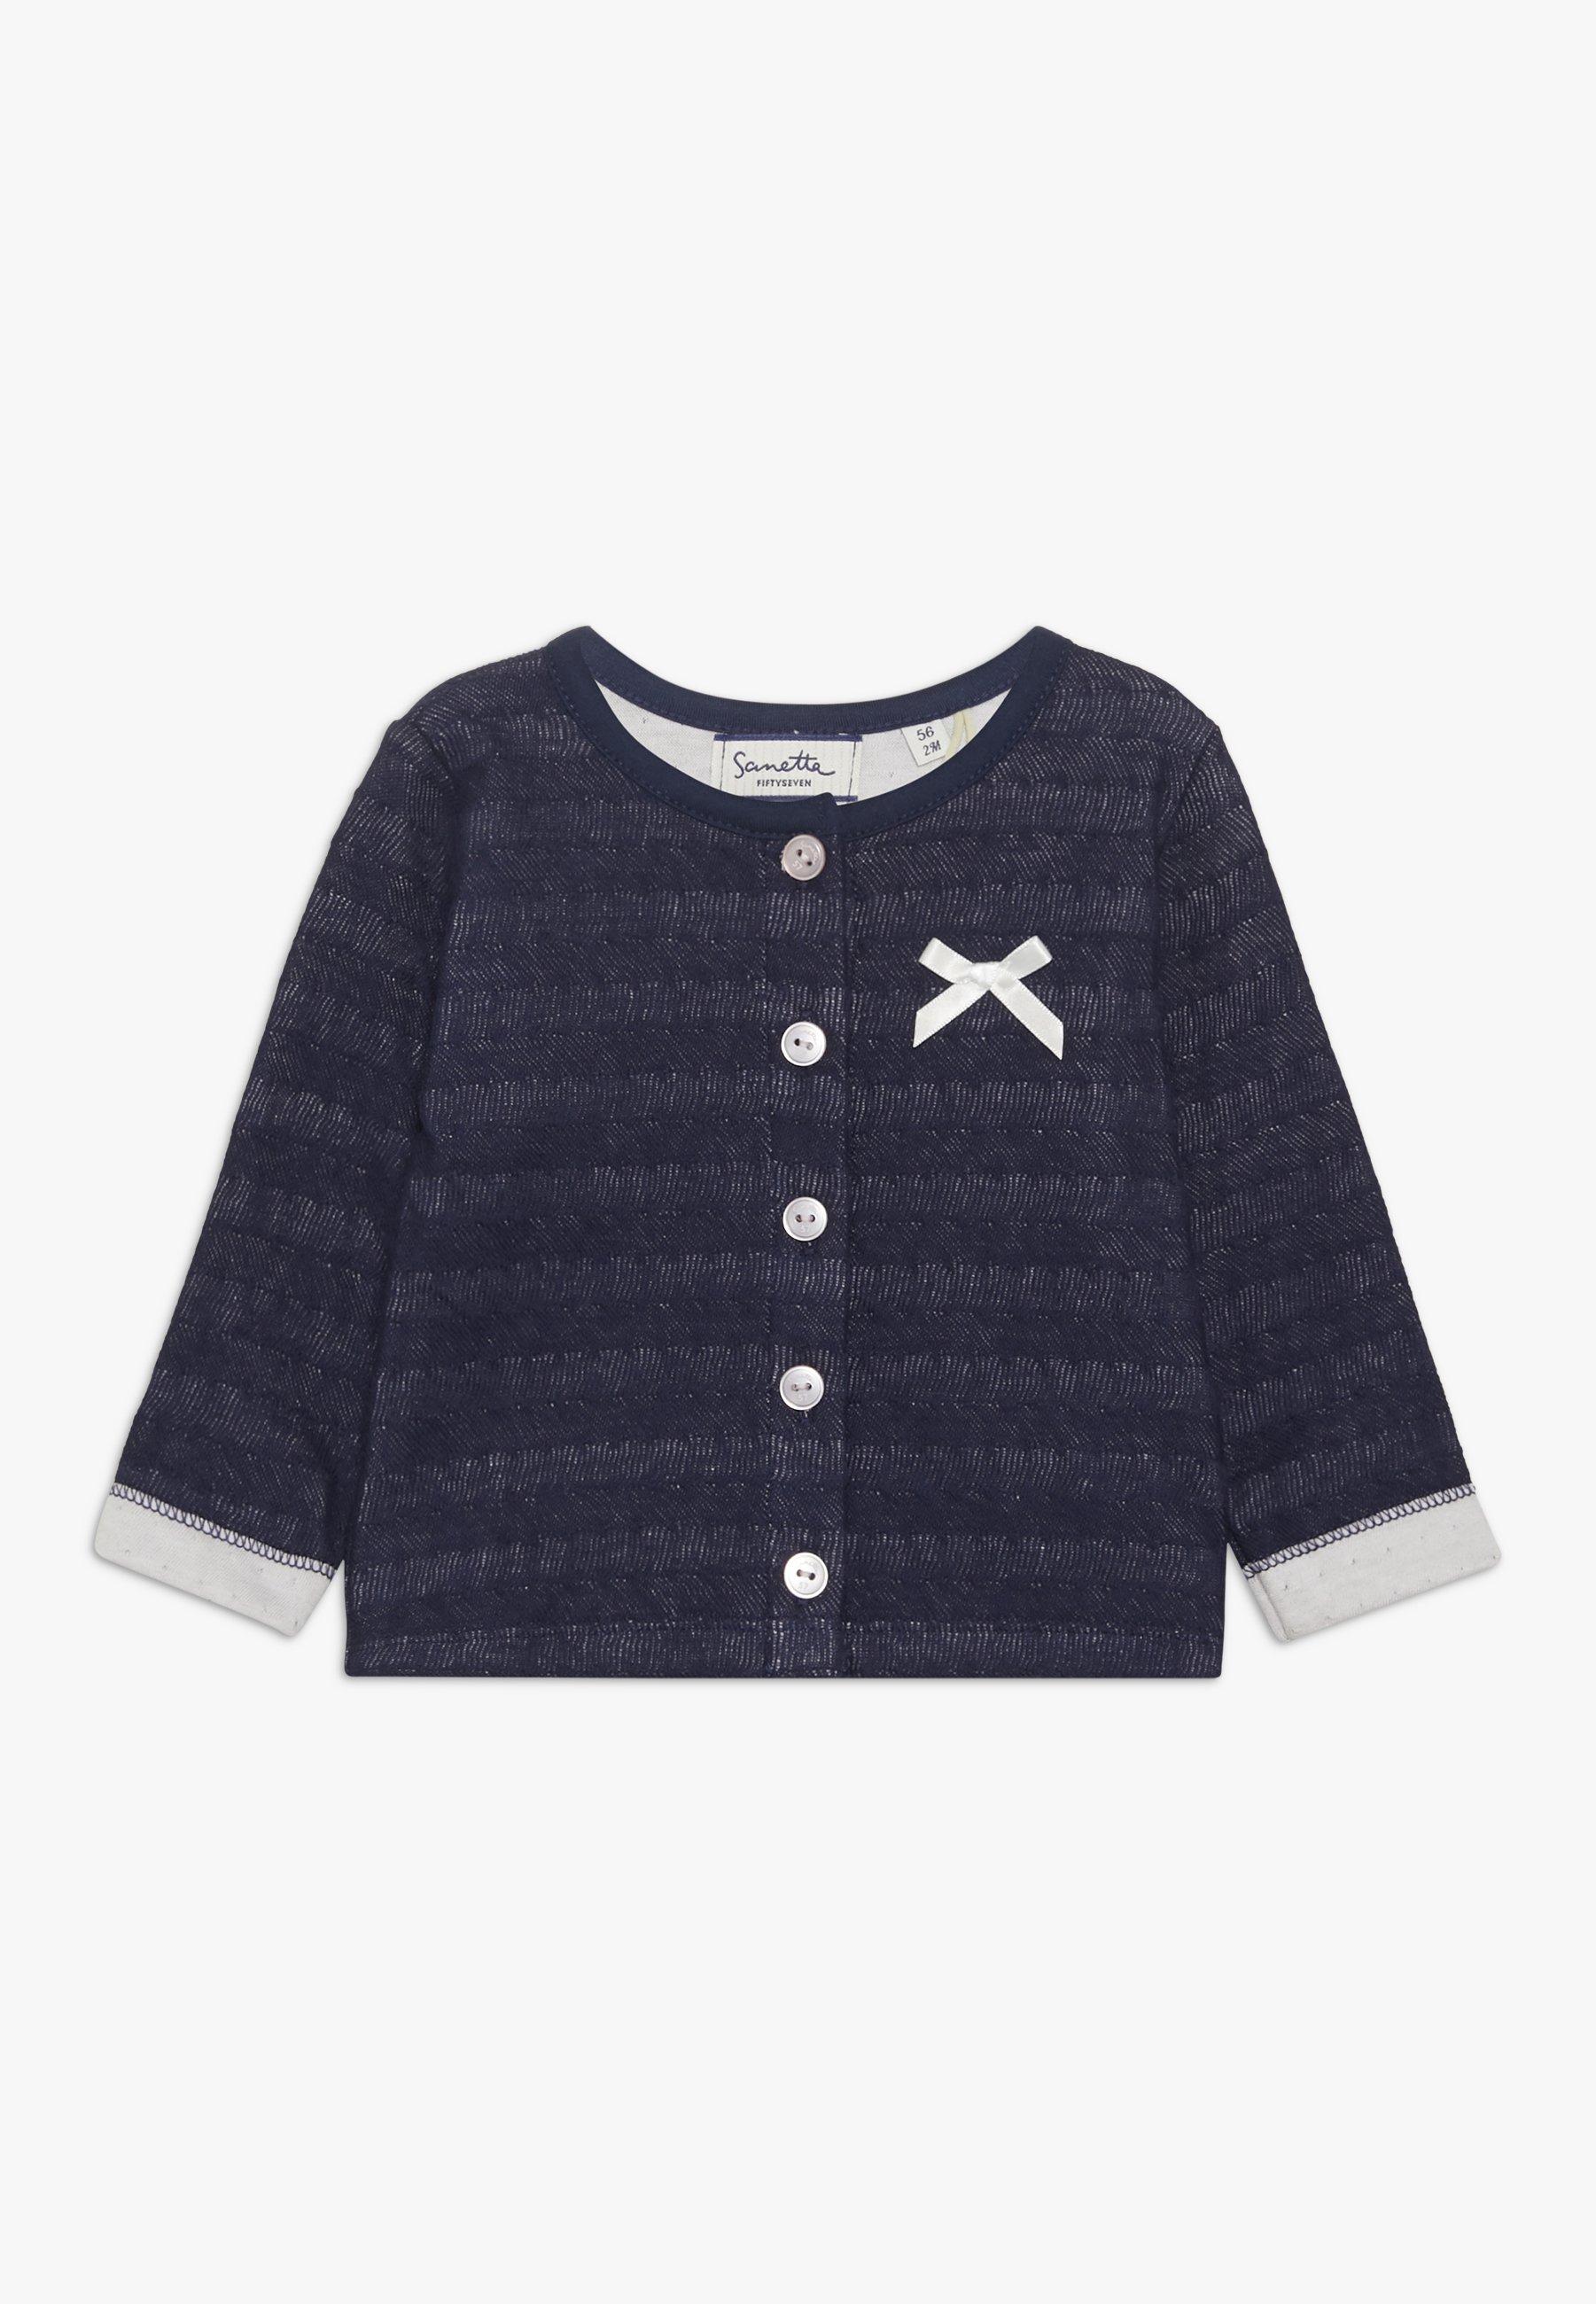 Große Förderung Sanetta fiftyseven BABY - Strickjacke - deepblue | Damenbekleidung 2020